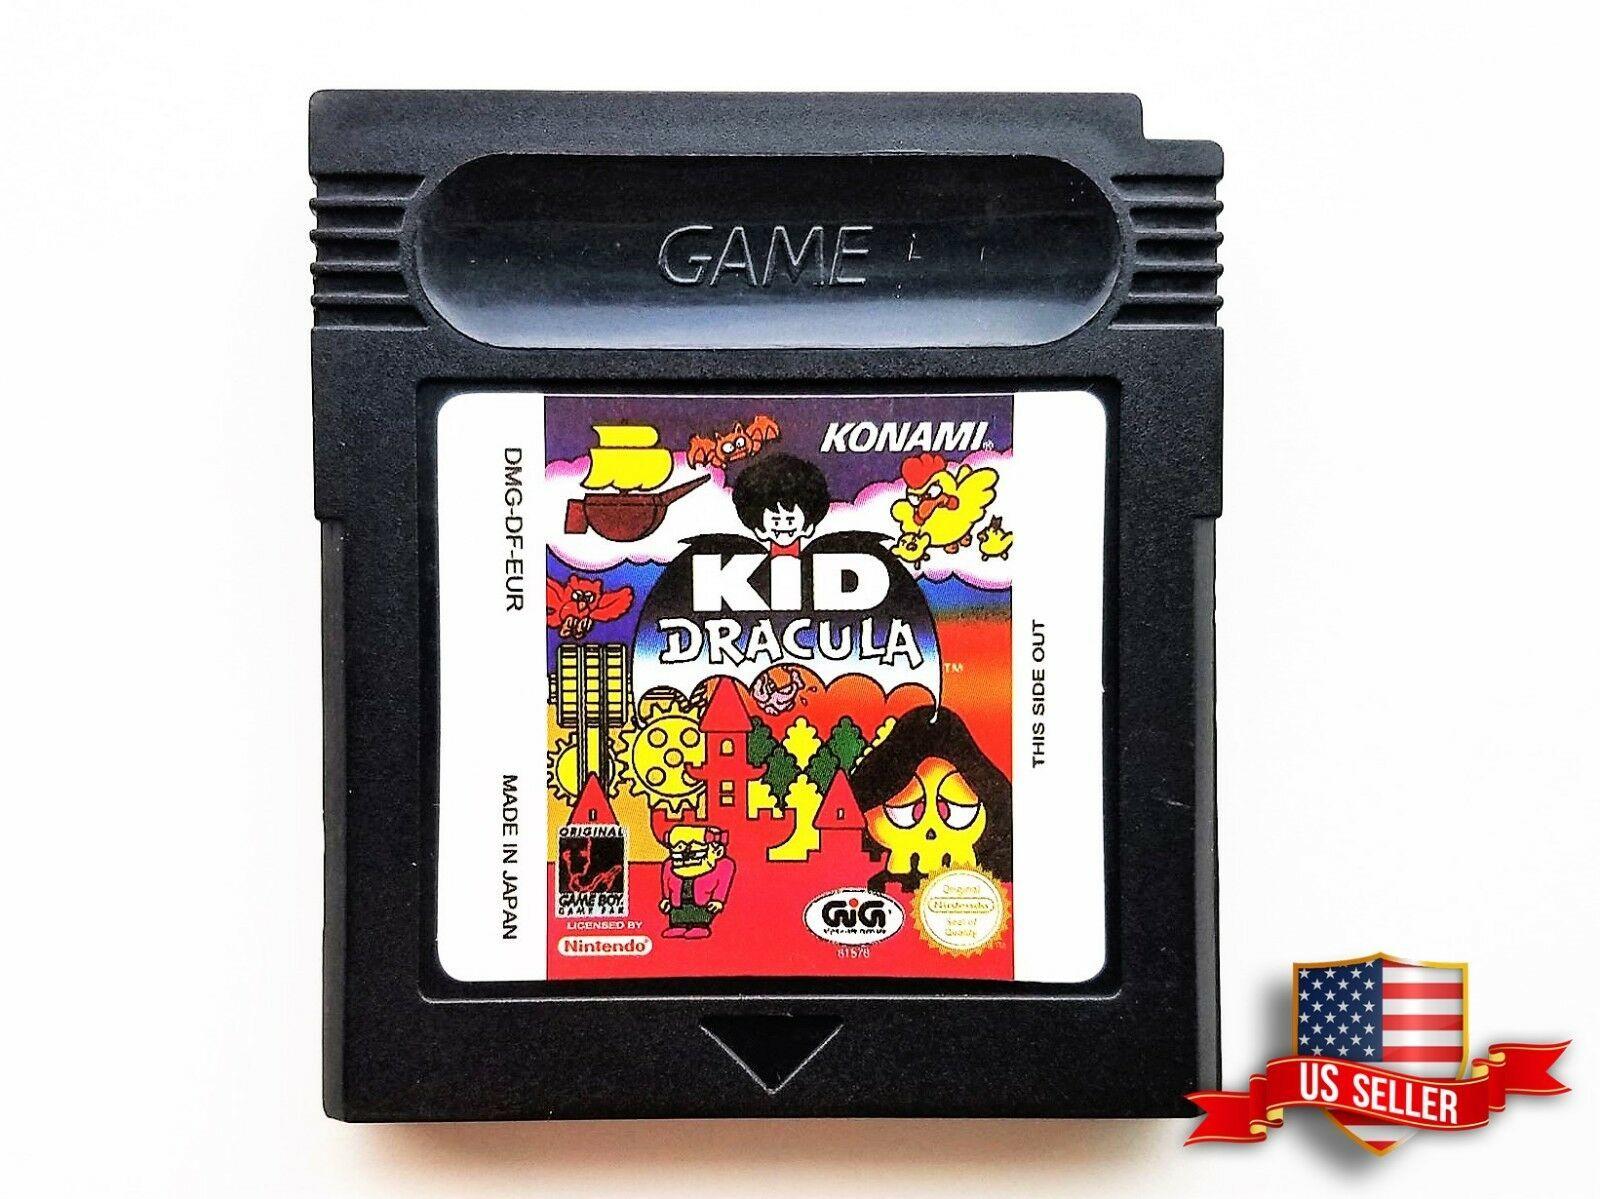 Kid Dracula Nintendo Game Boy - Custom Black Shell (Konami / Castlevania) - USA